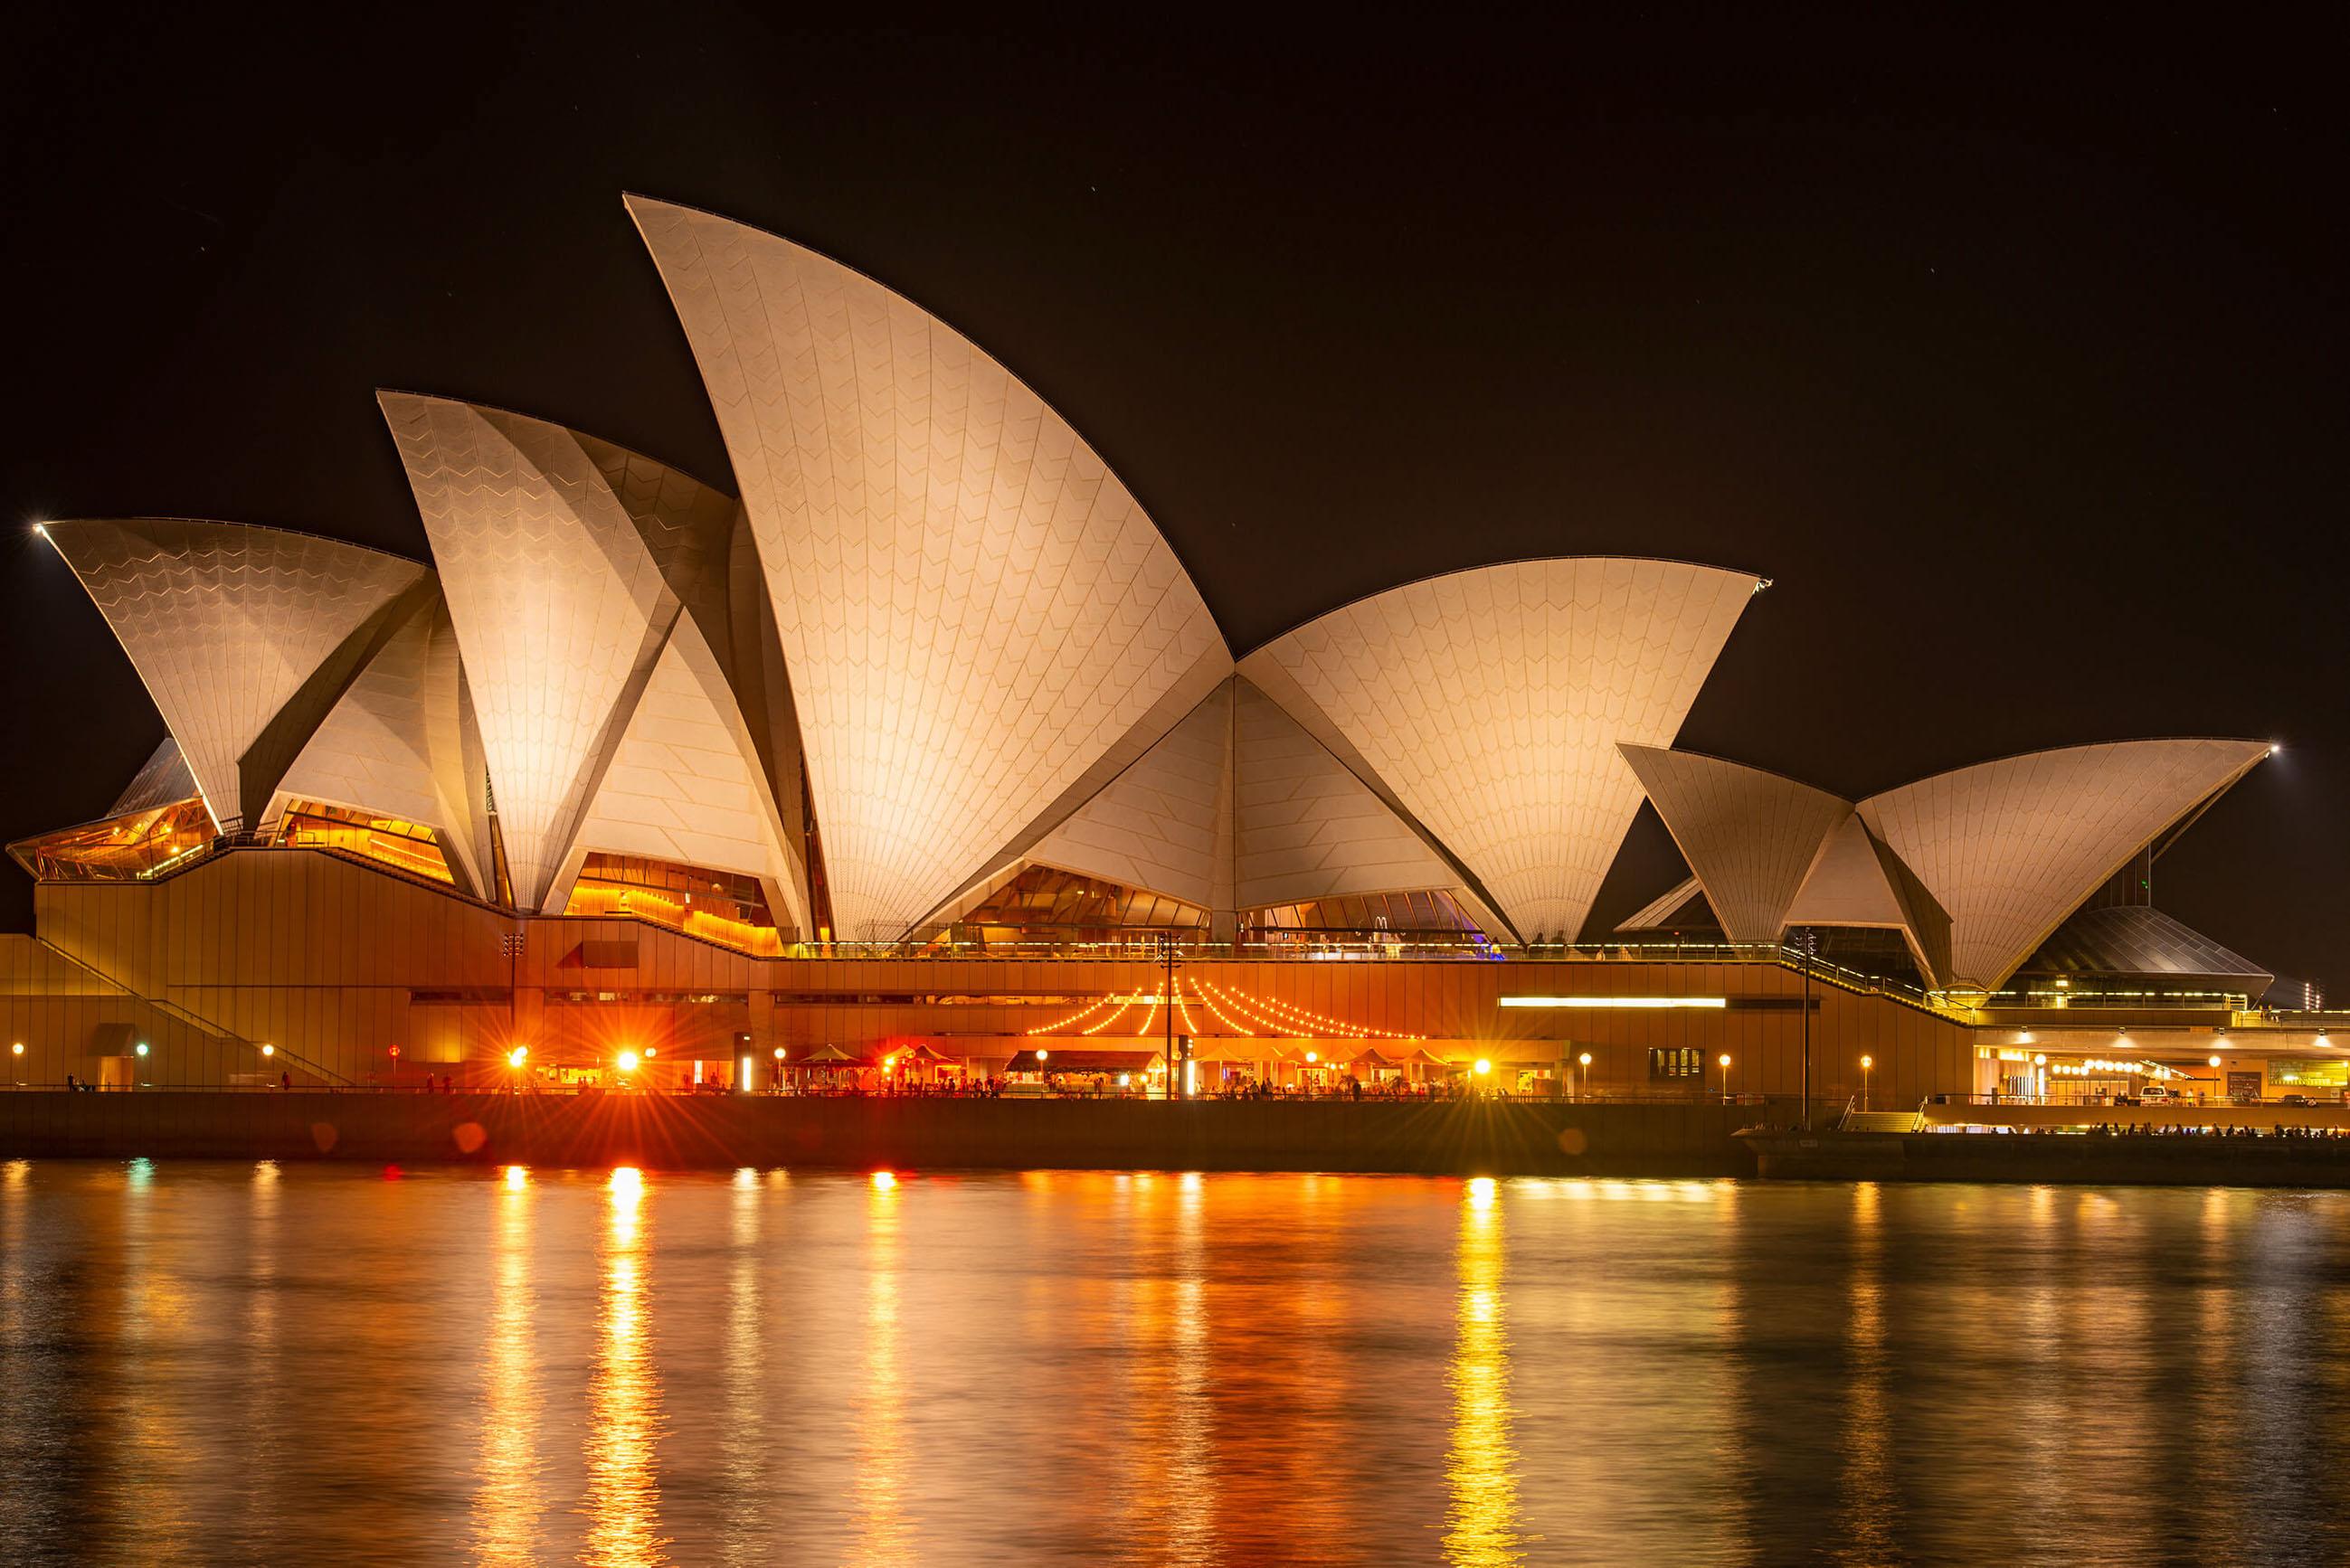 https://bubo.sk/uploads/galleries/5027/roberttaraba_australia_sydney14.jpg